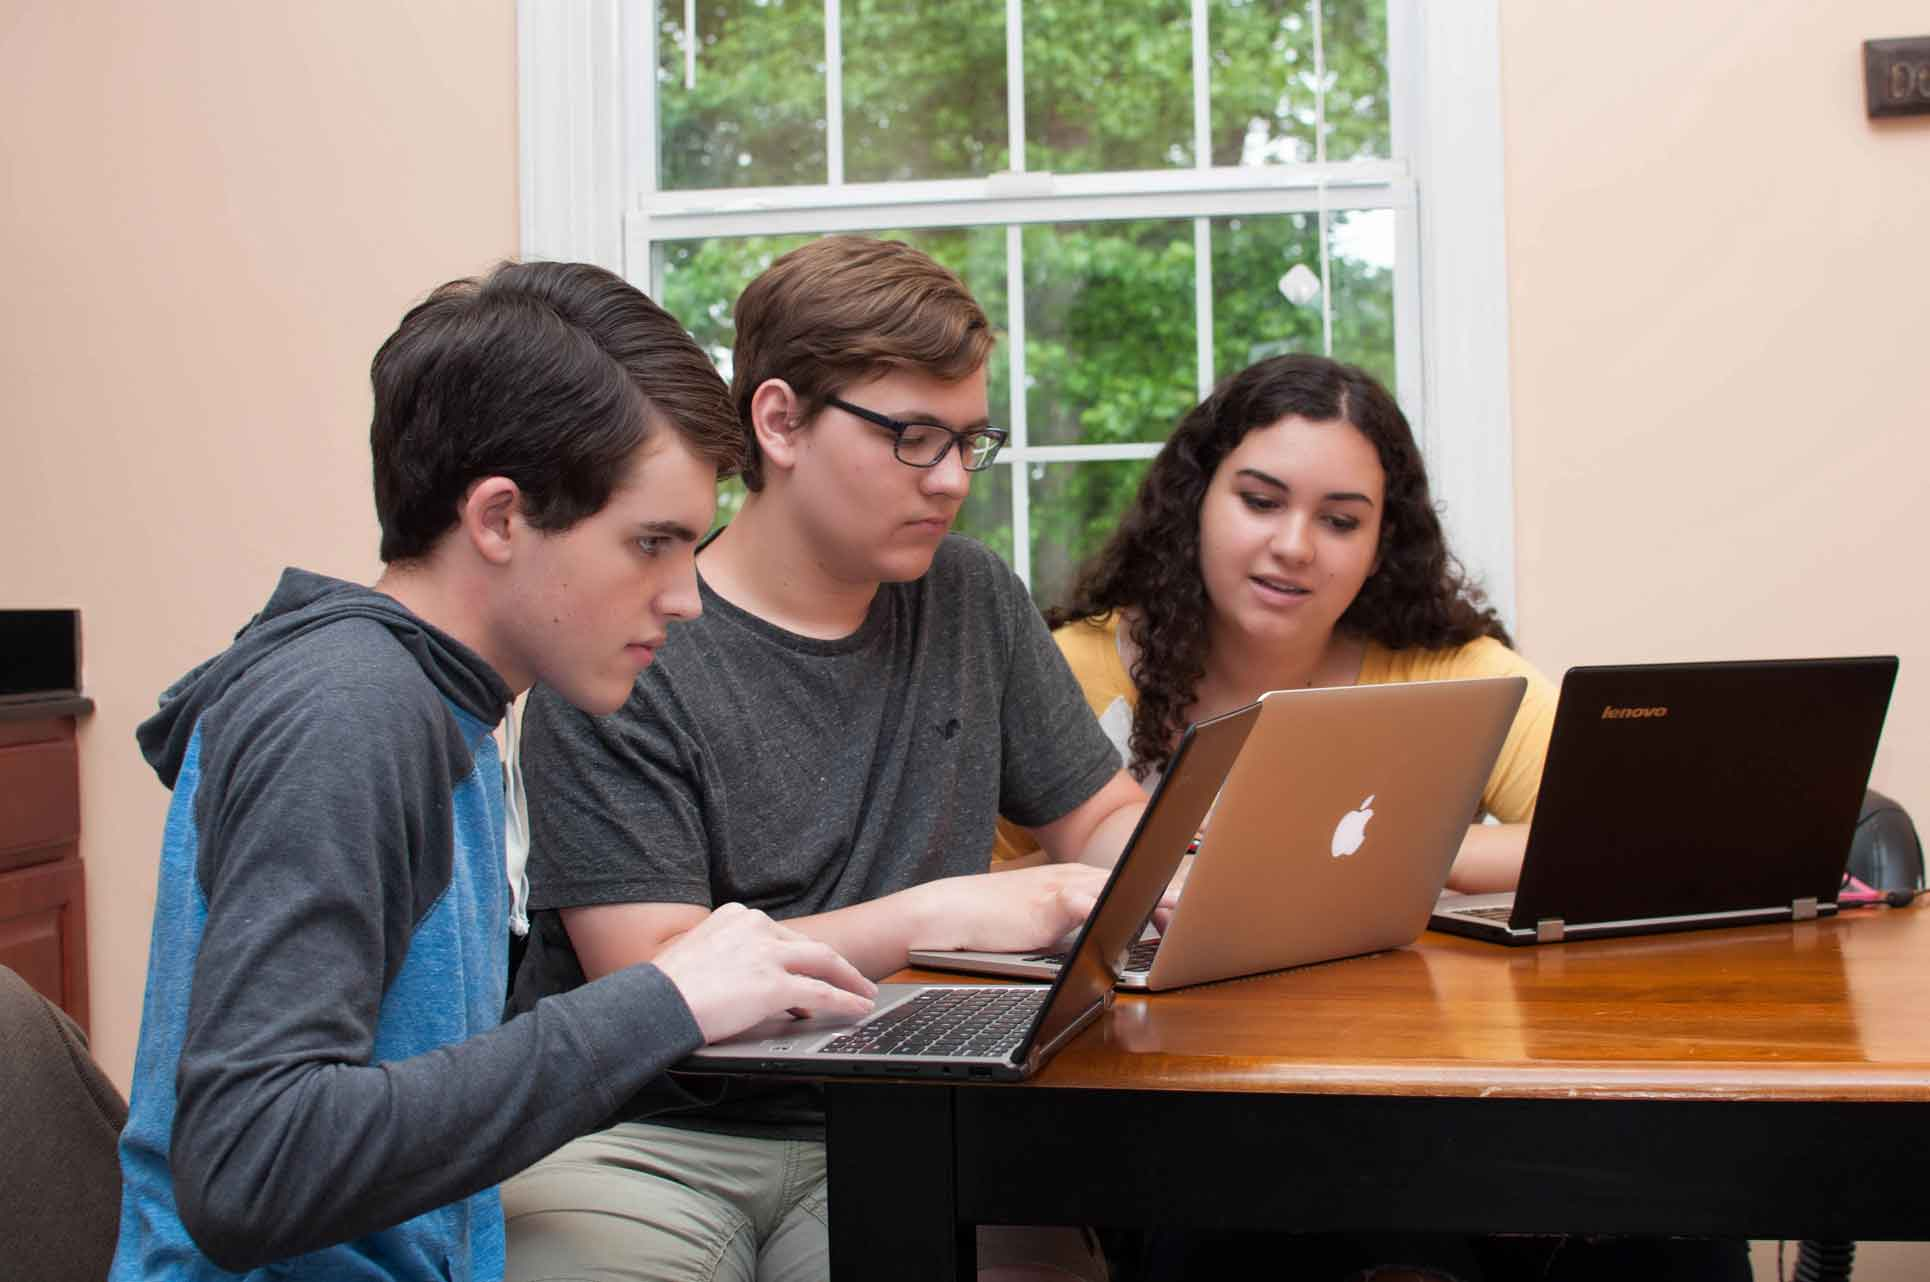 Private-Christian-High-School-Students-near-Burlington-between-Greensboro-NC-working-on-computers